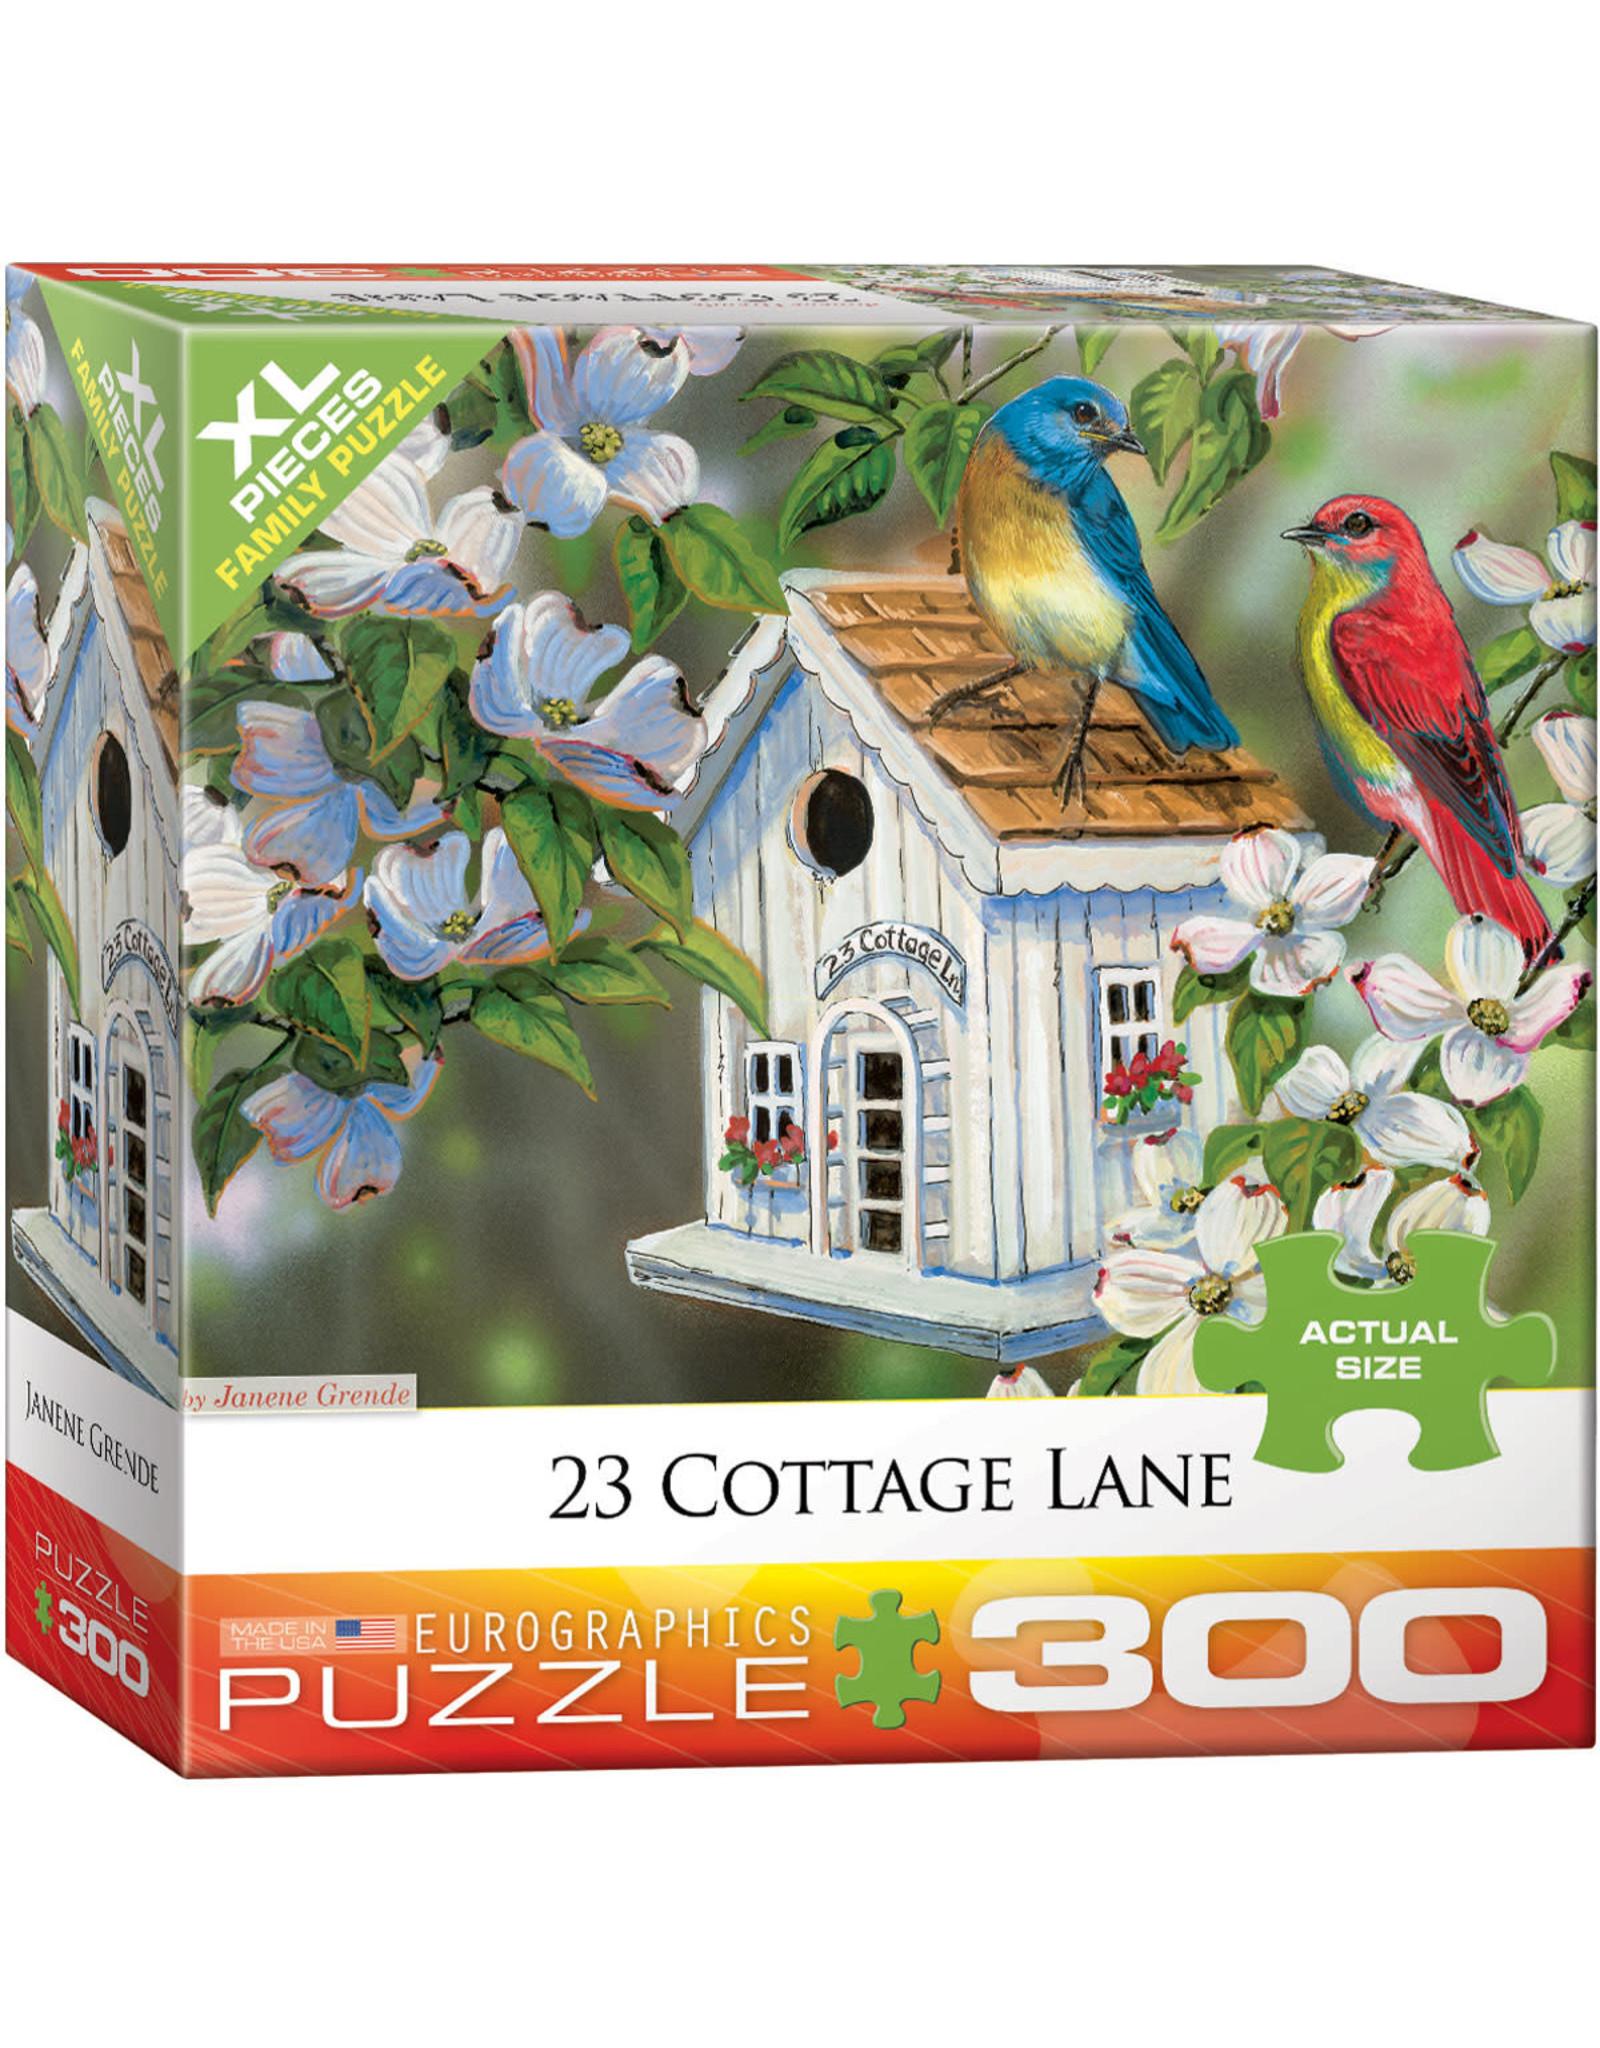 Eurographics 23 Cottage Lane 300 pc